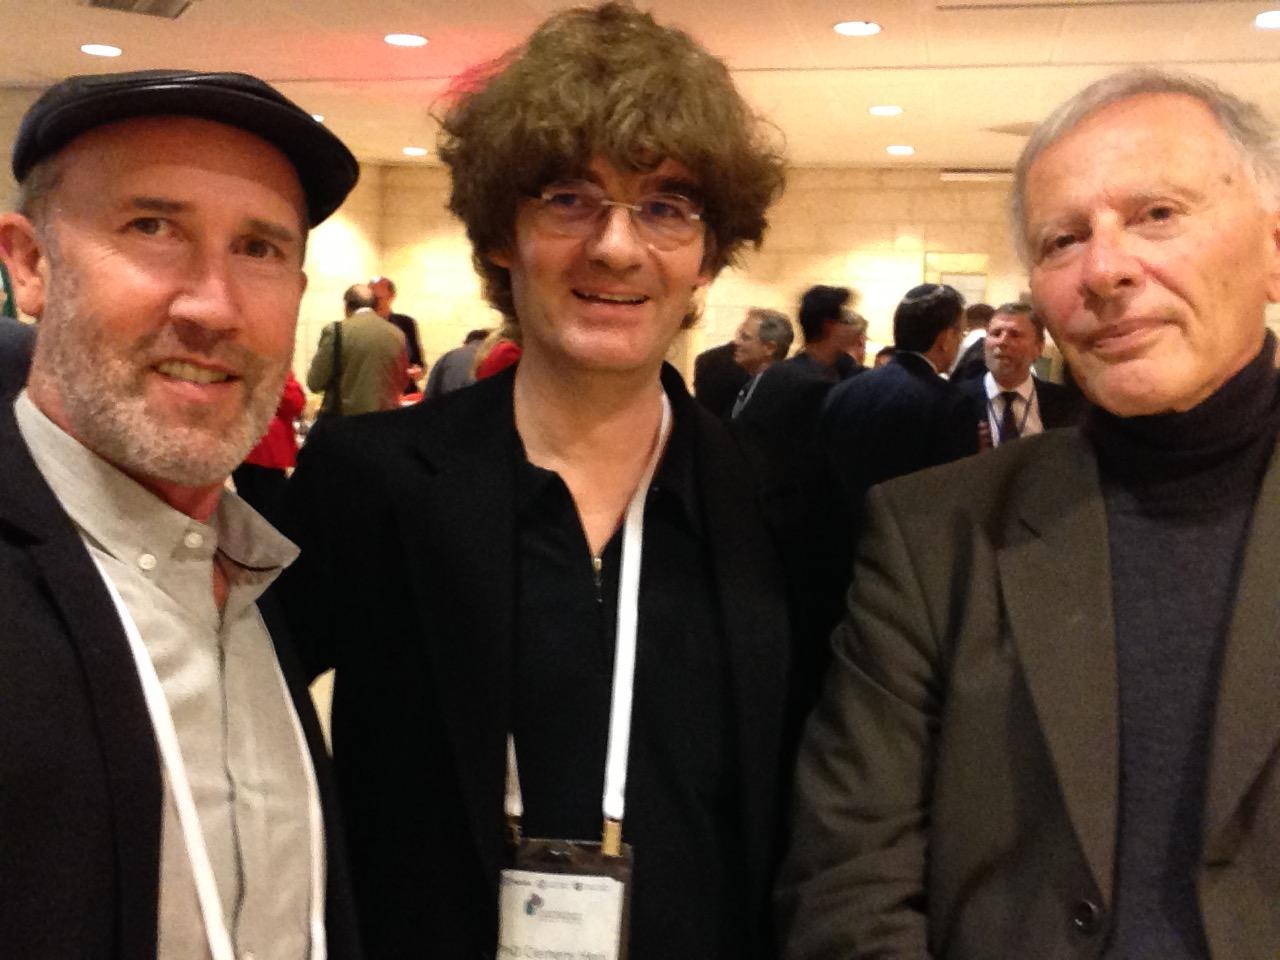 Robert Wistrich Clemens Heni Perry Trotter May 14, 2015, Jerusalem